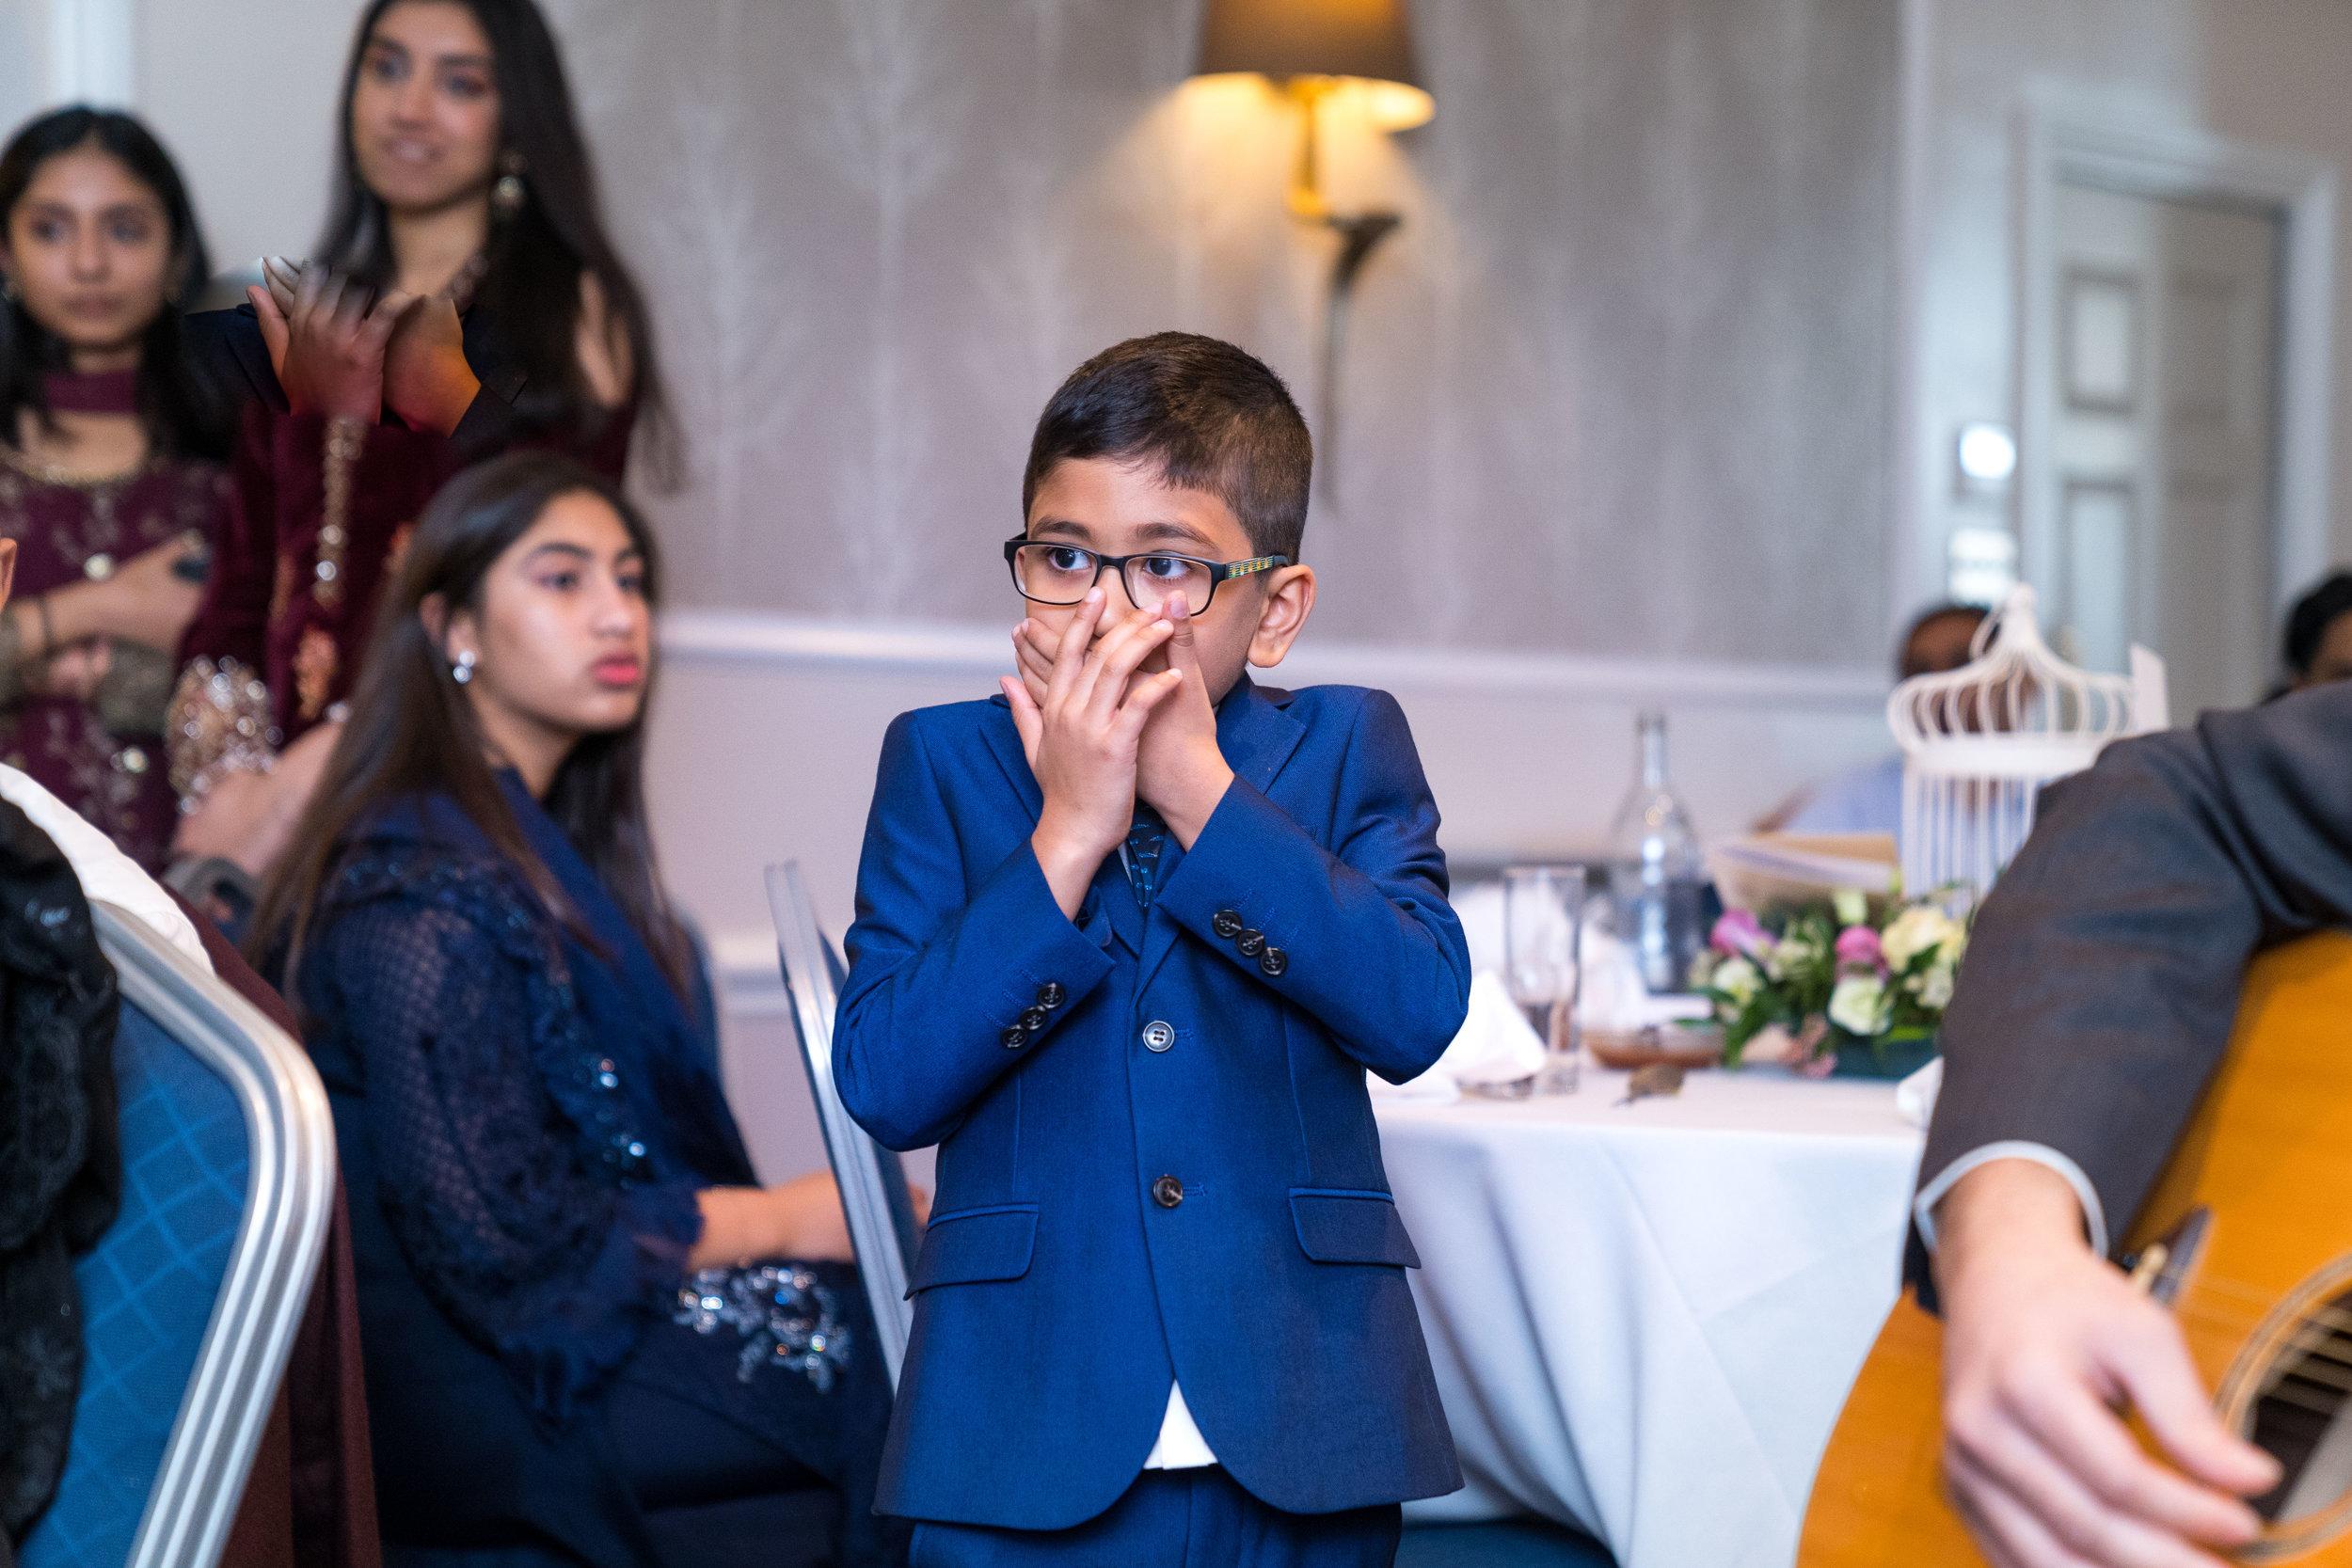 buckinghamshire-golf-club-winter-muslim-wedding-engagement-photography-videography-47